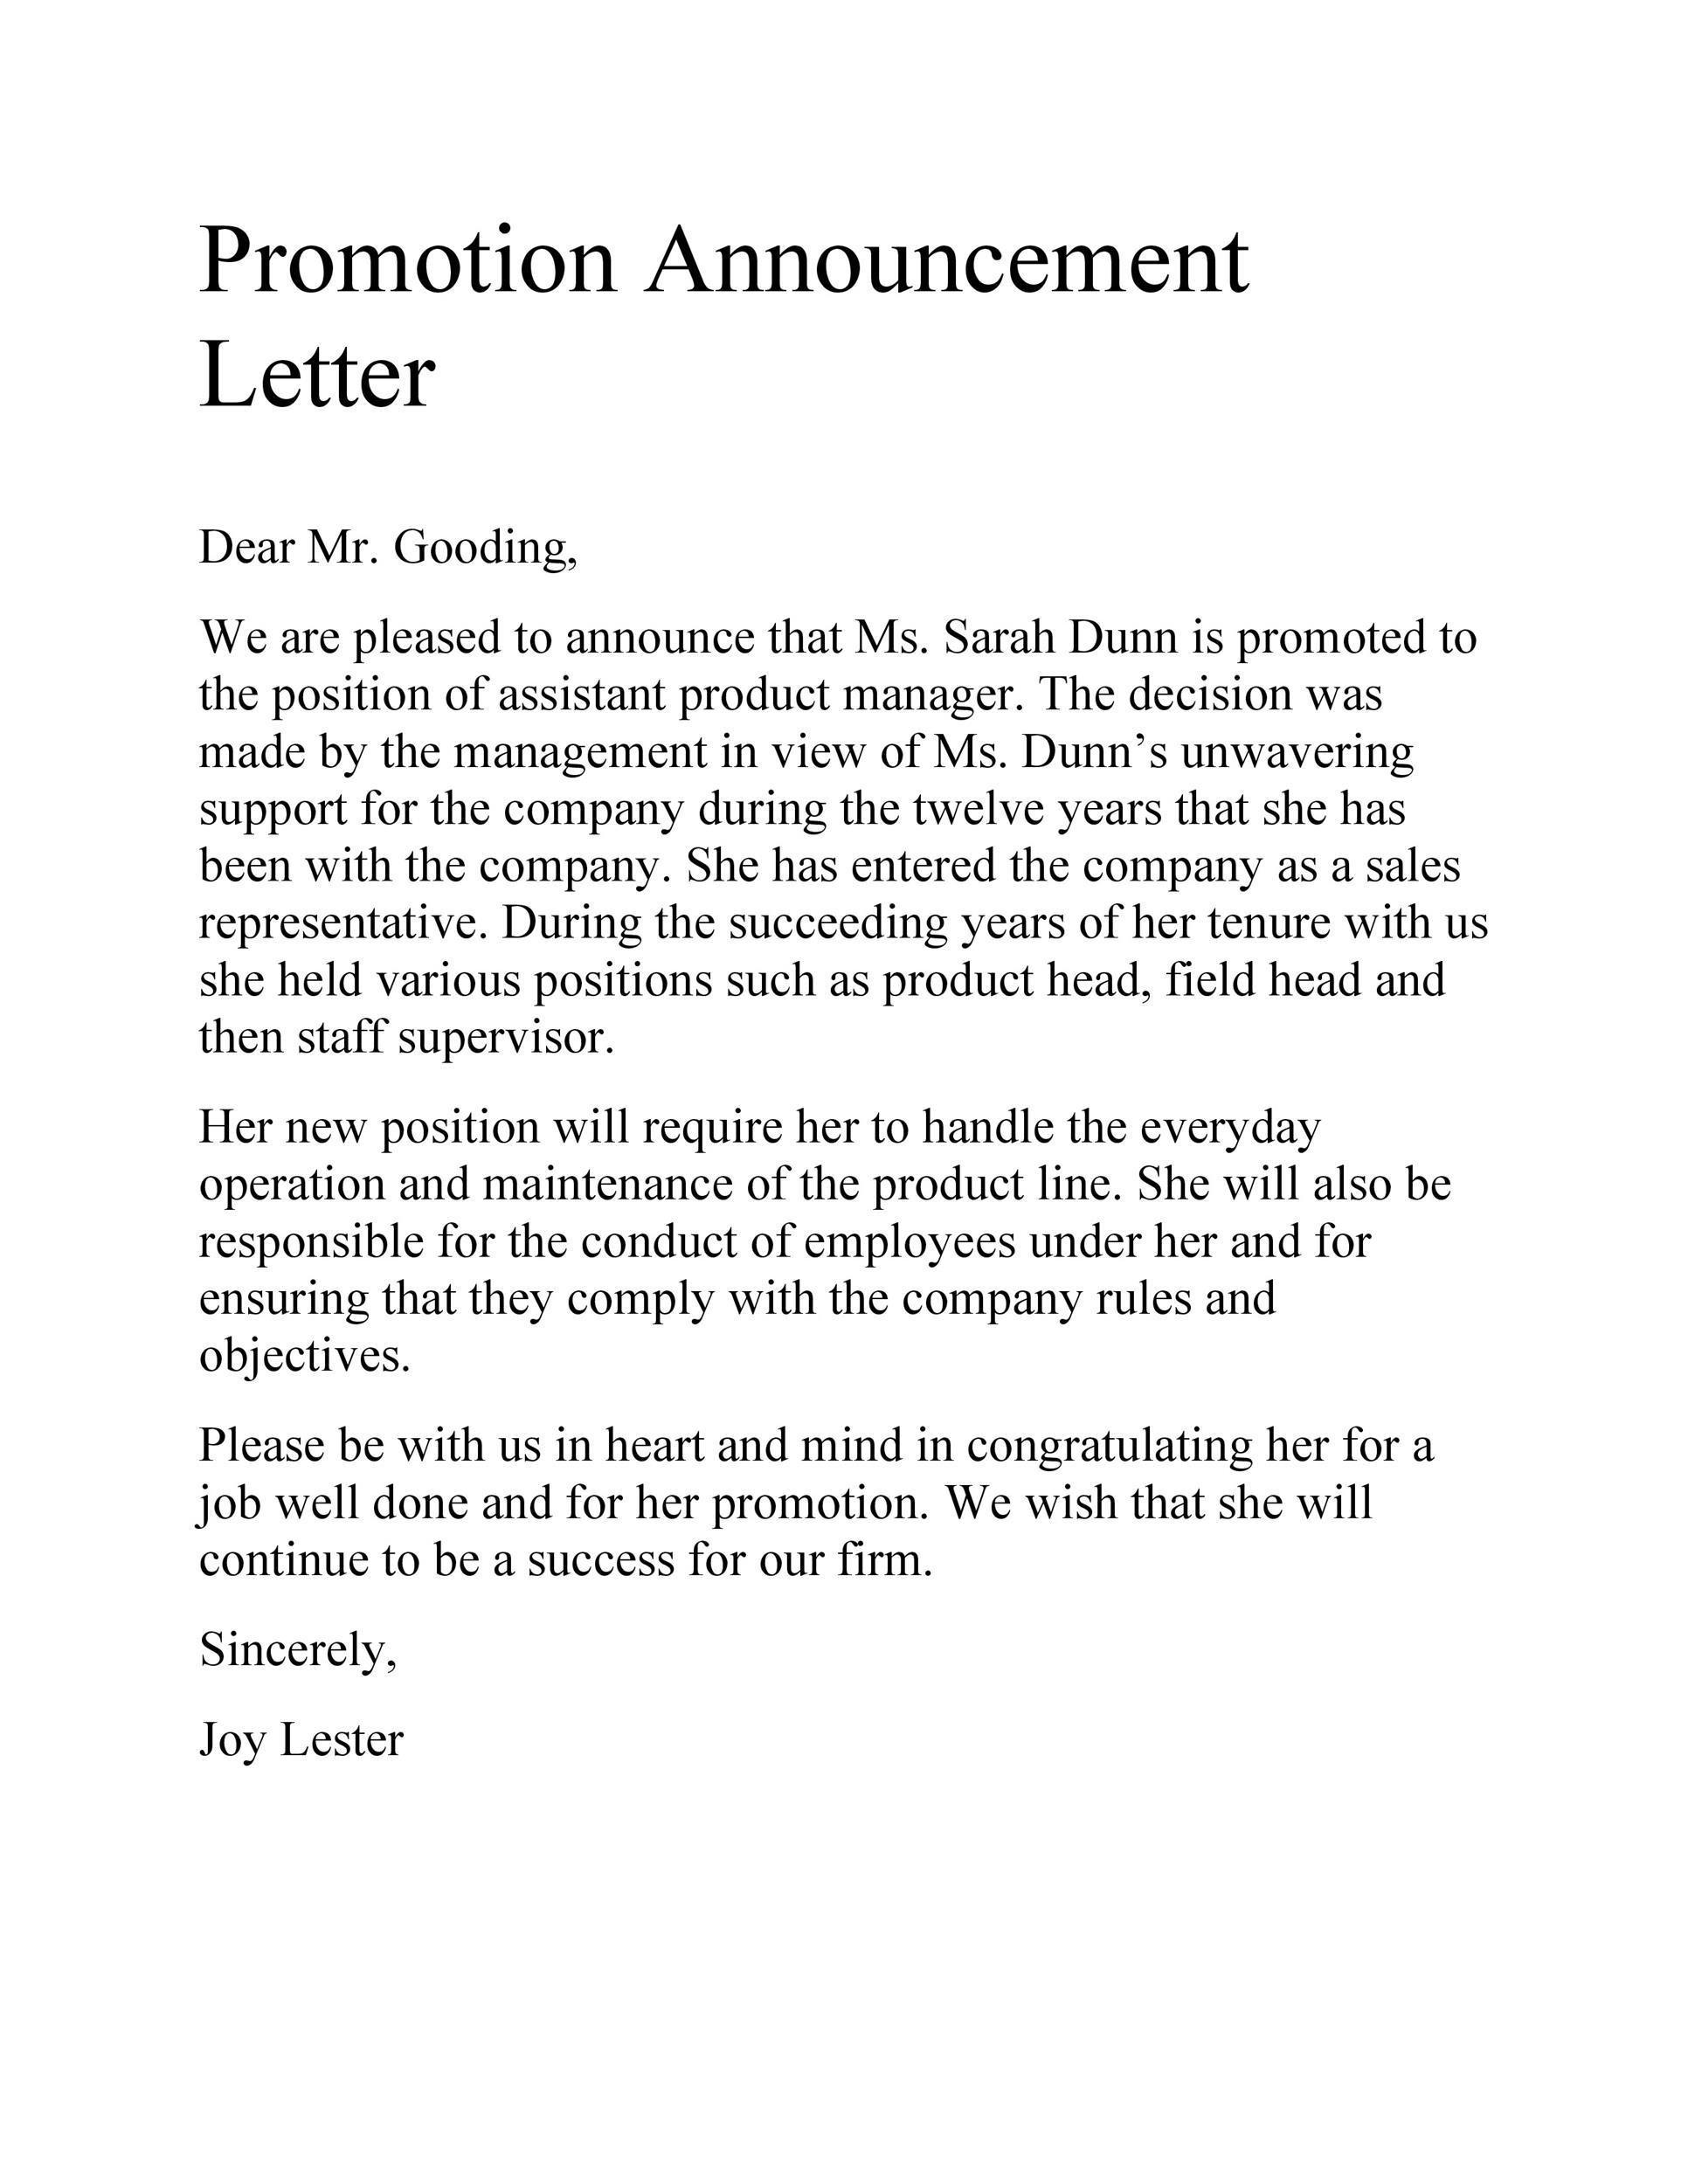 Free promotion letter 36